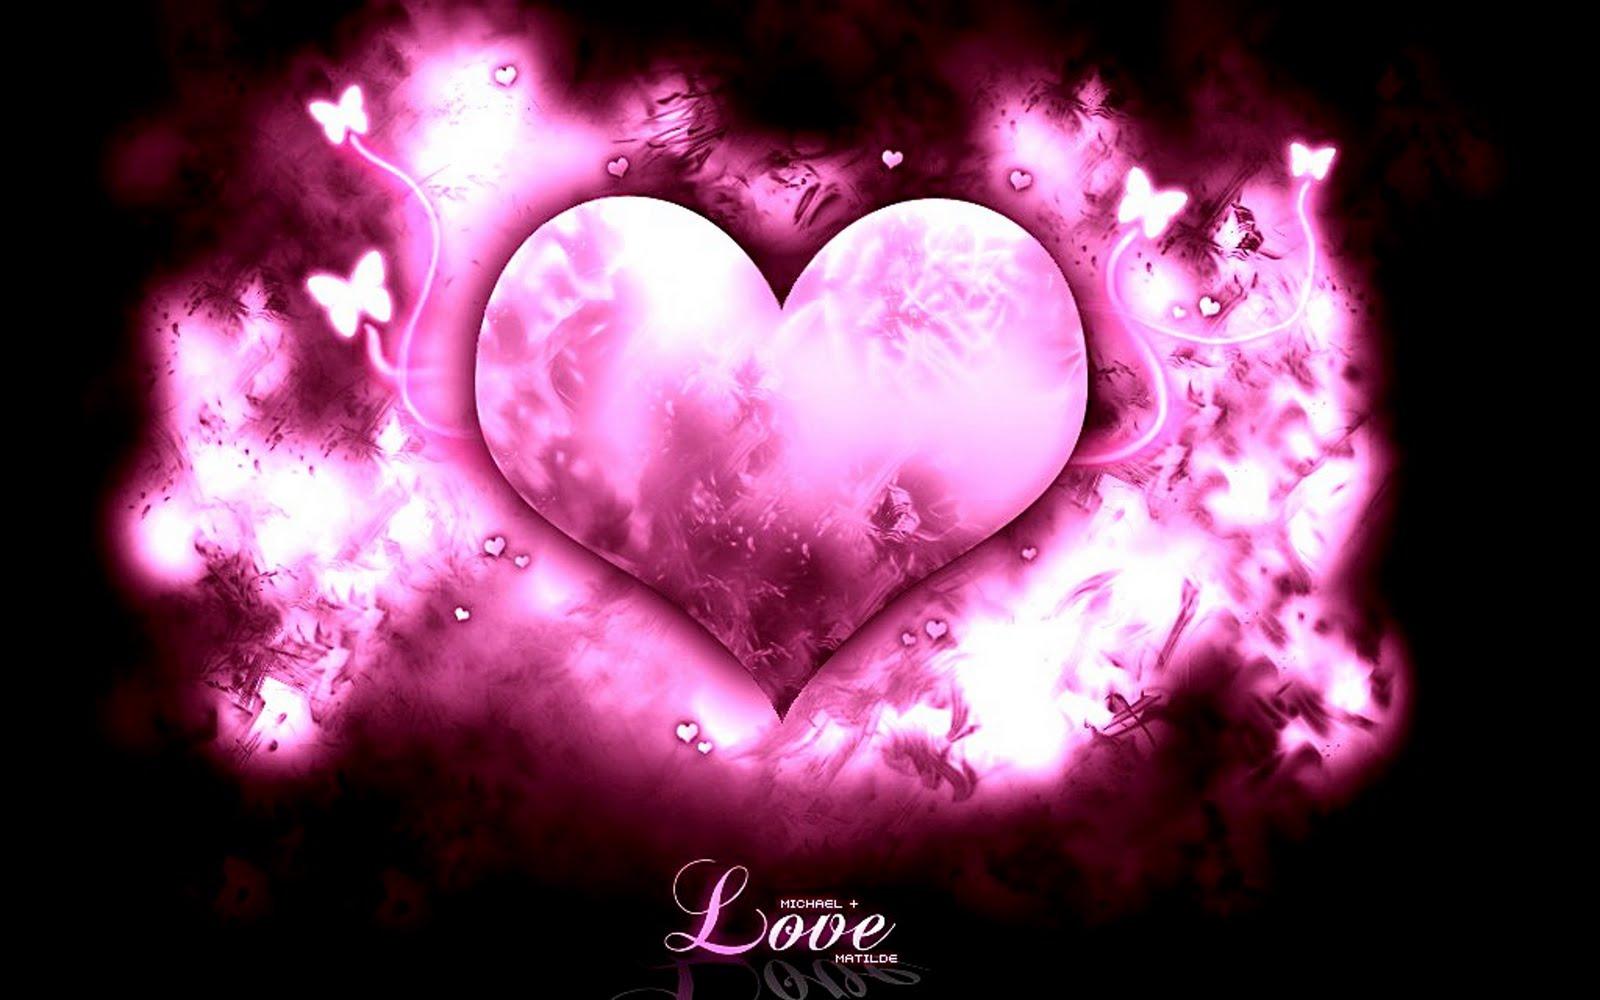 Cute Love Wallpaper Desktop Download HD Wallpapers 1600x1000